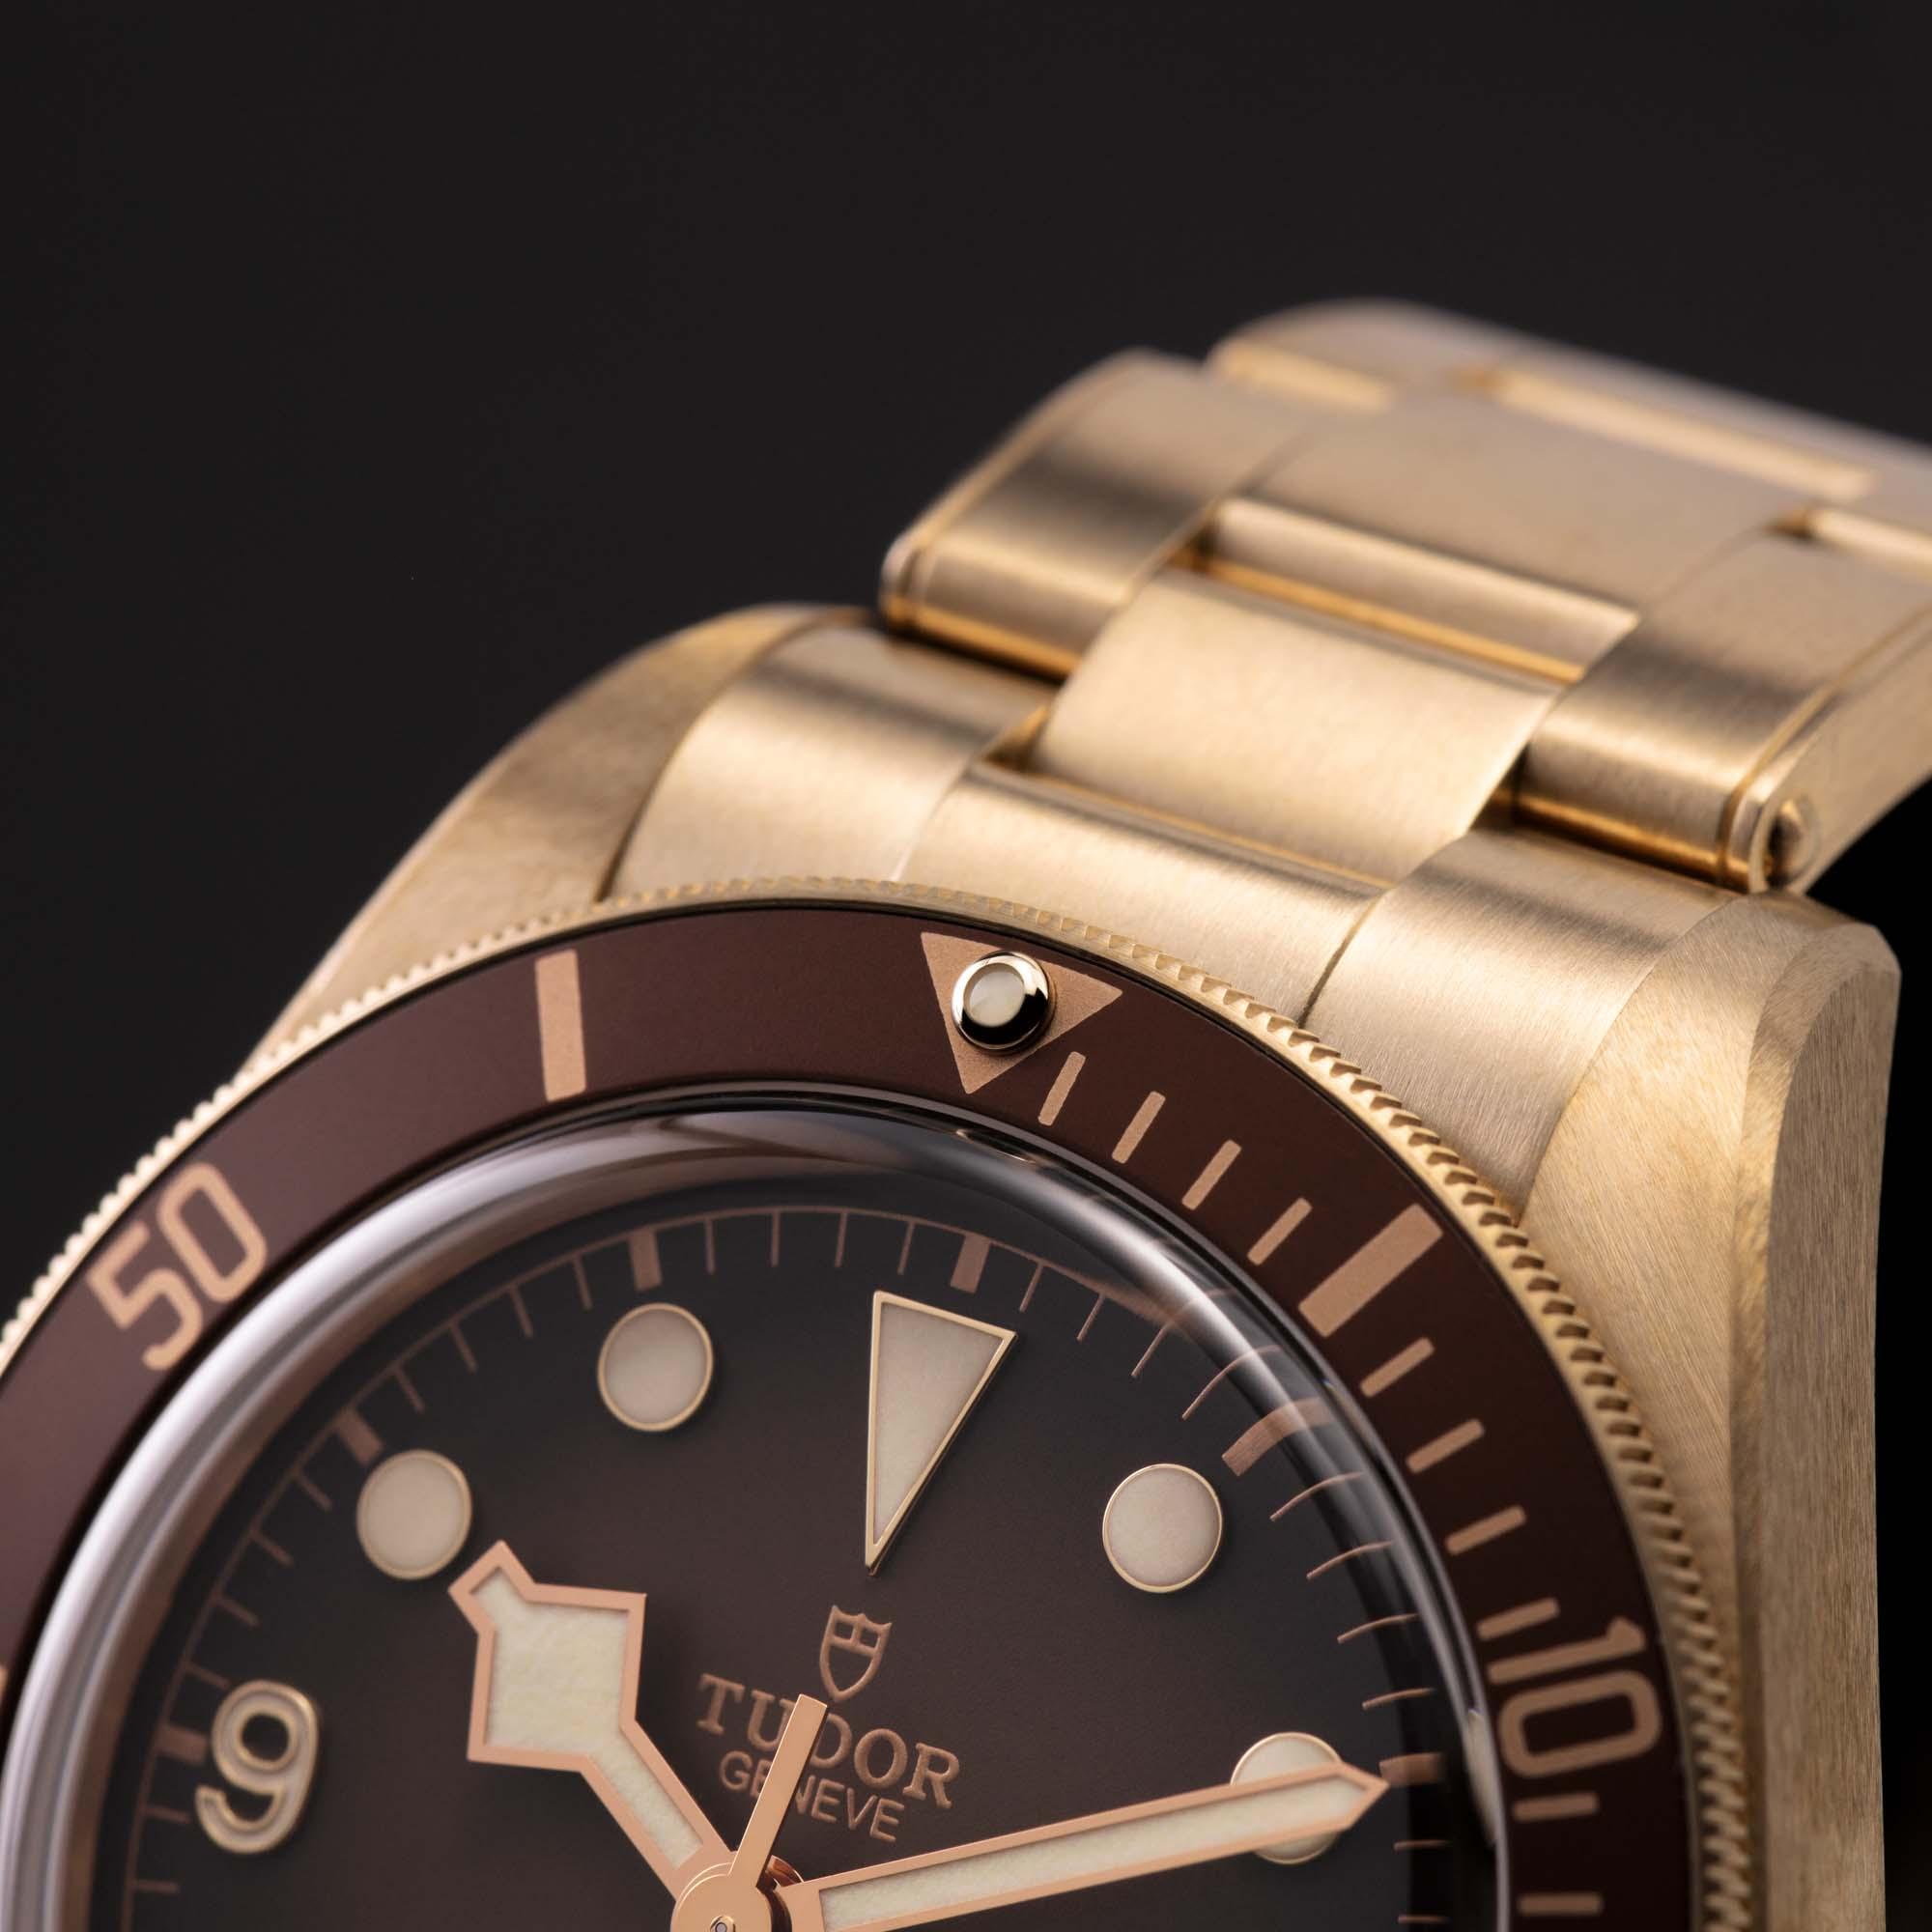 Tudor Black Bay Fifty-Eight Bronze Boutique Edition 12 o'clock triangle